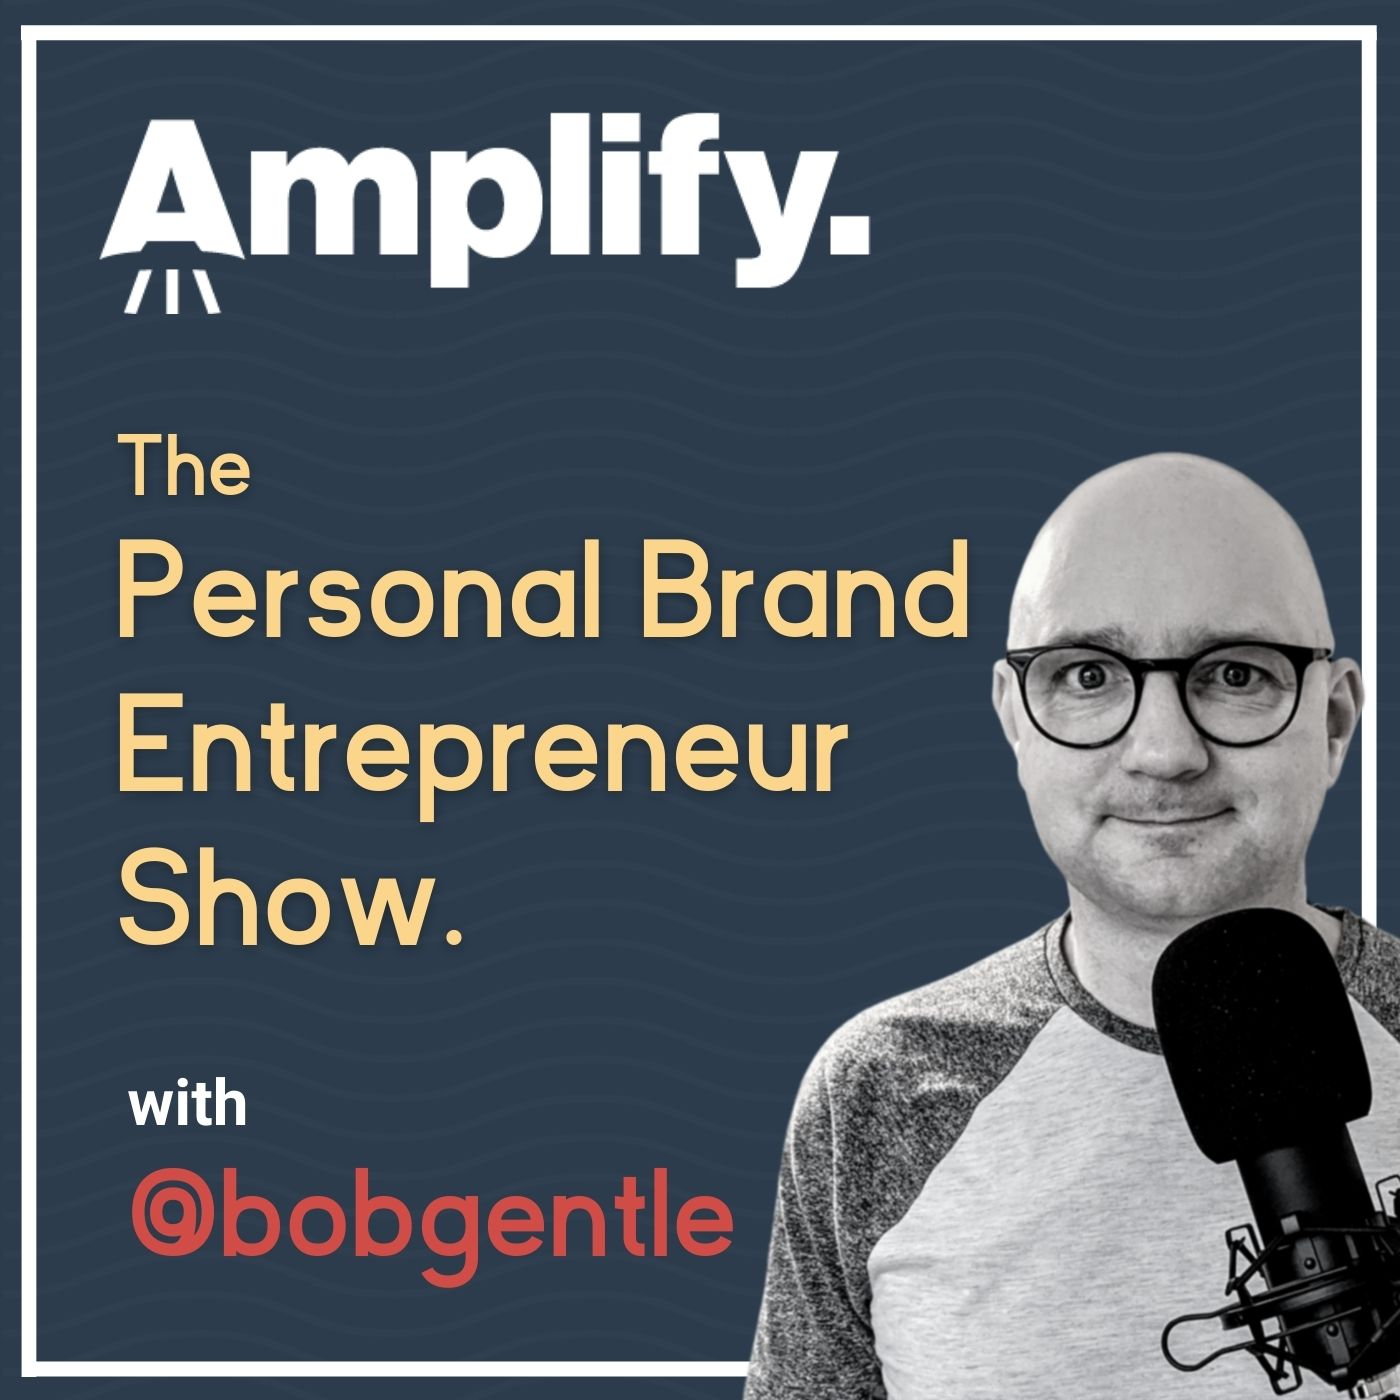 Artwork for podcast The Personal Brand Entrepreneur Show.